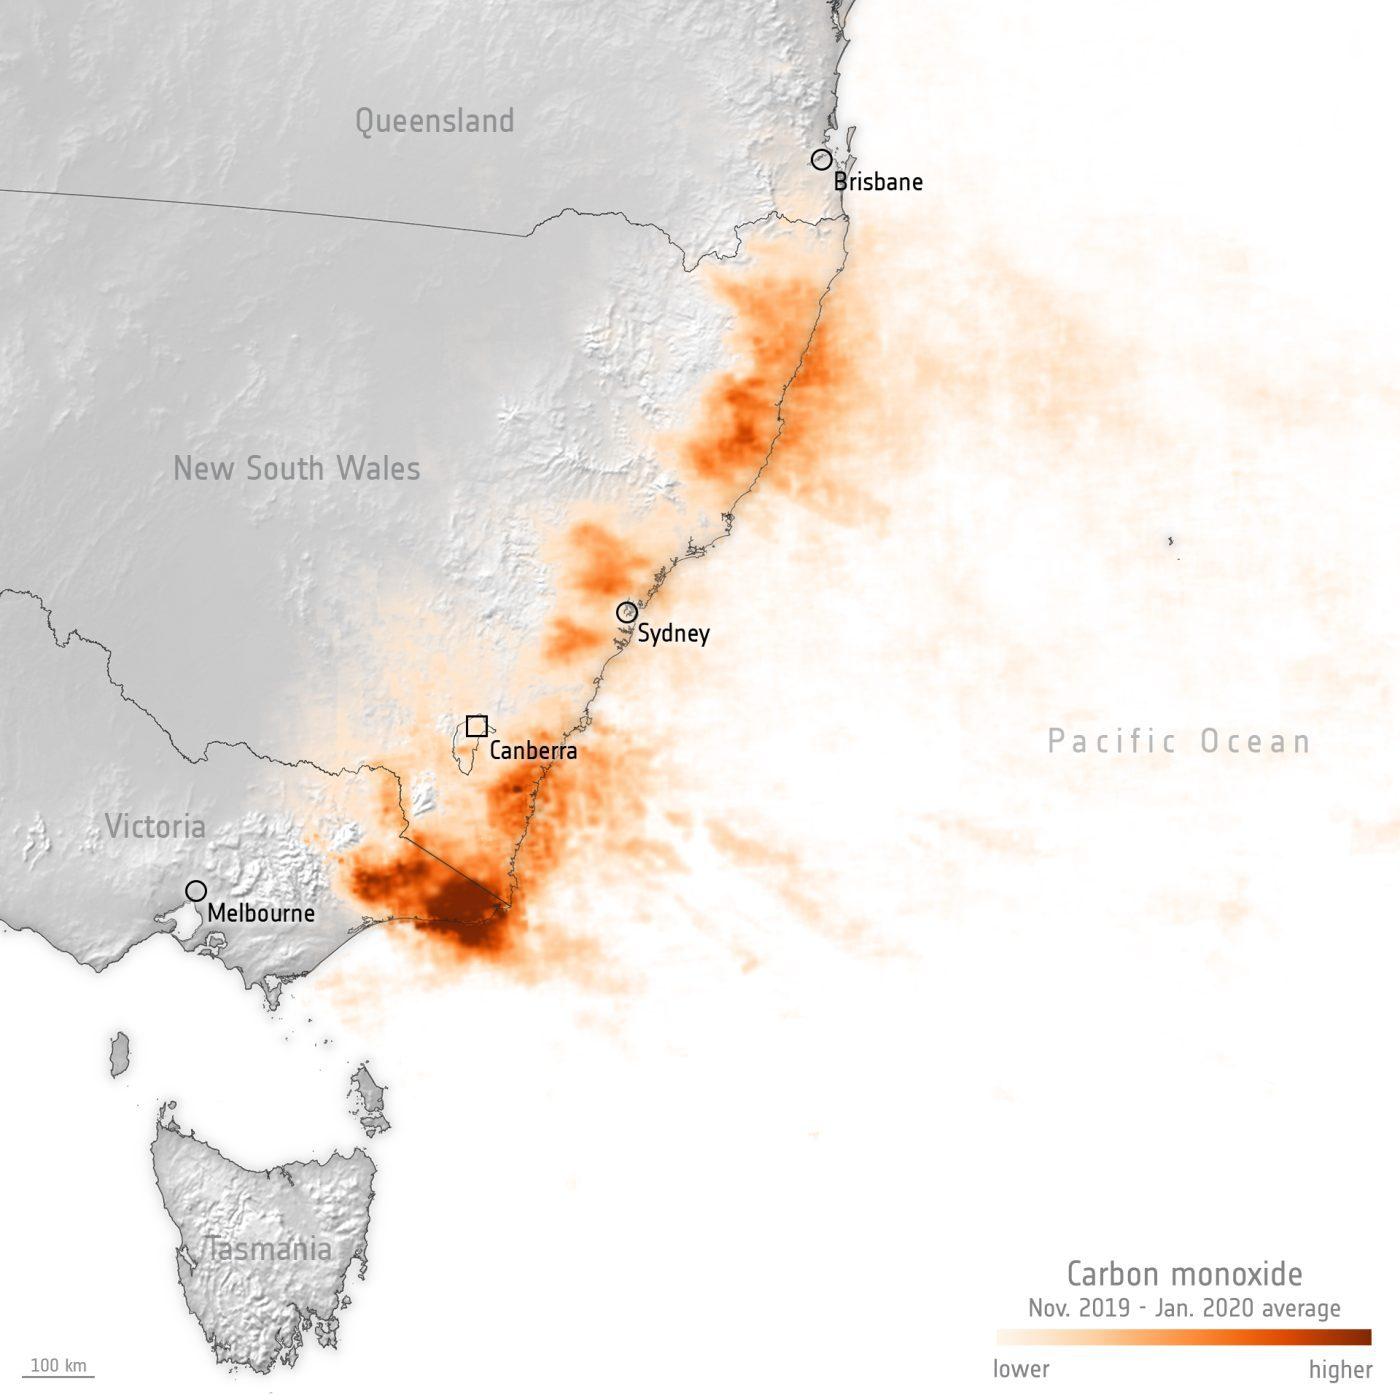 Carbon_monoxide_from_fires_in_Australia-e1633465746508